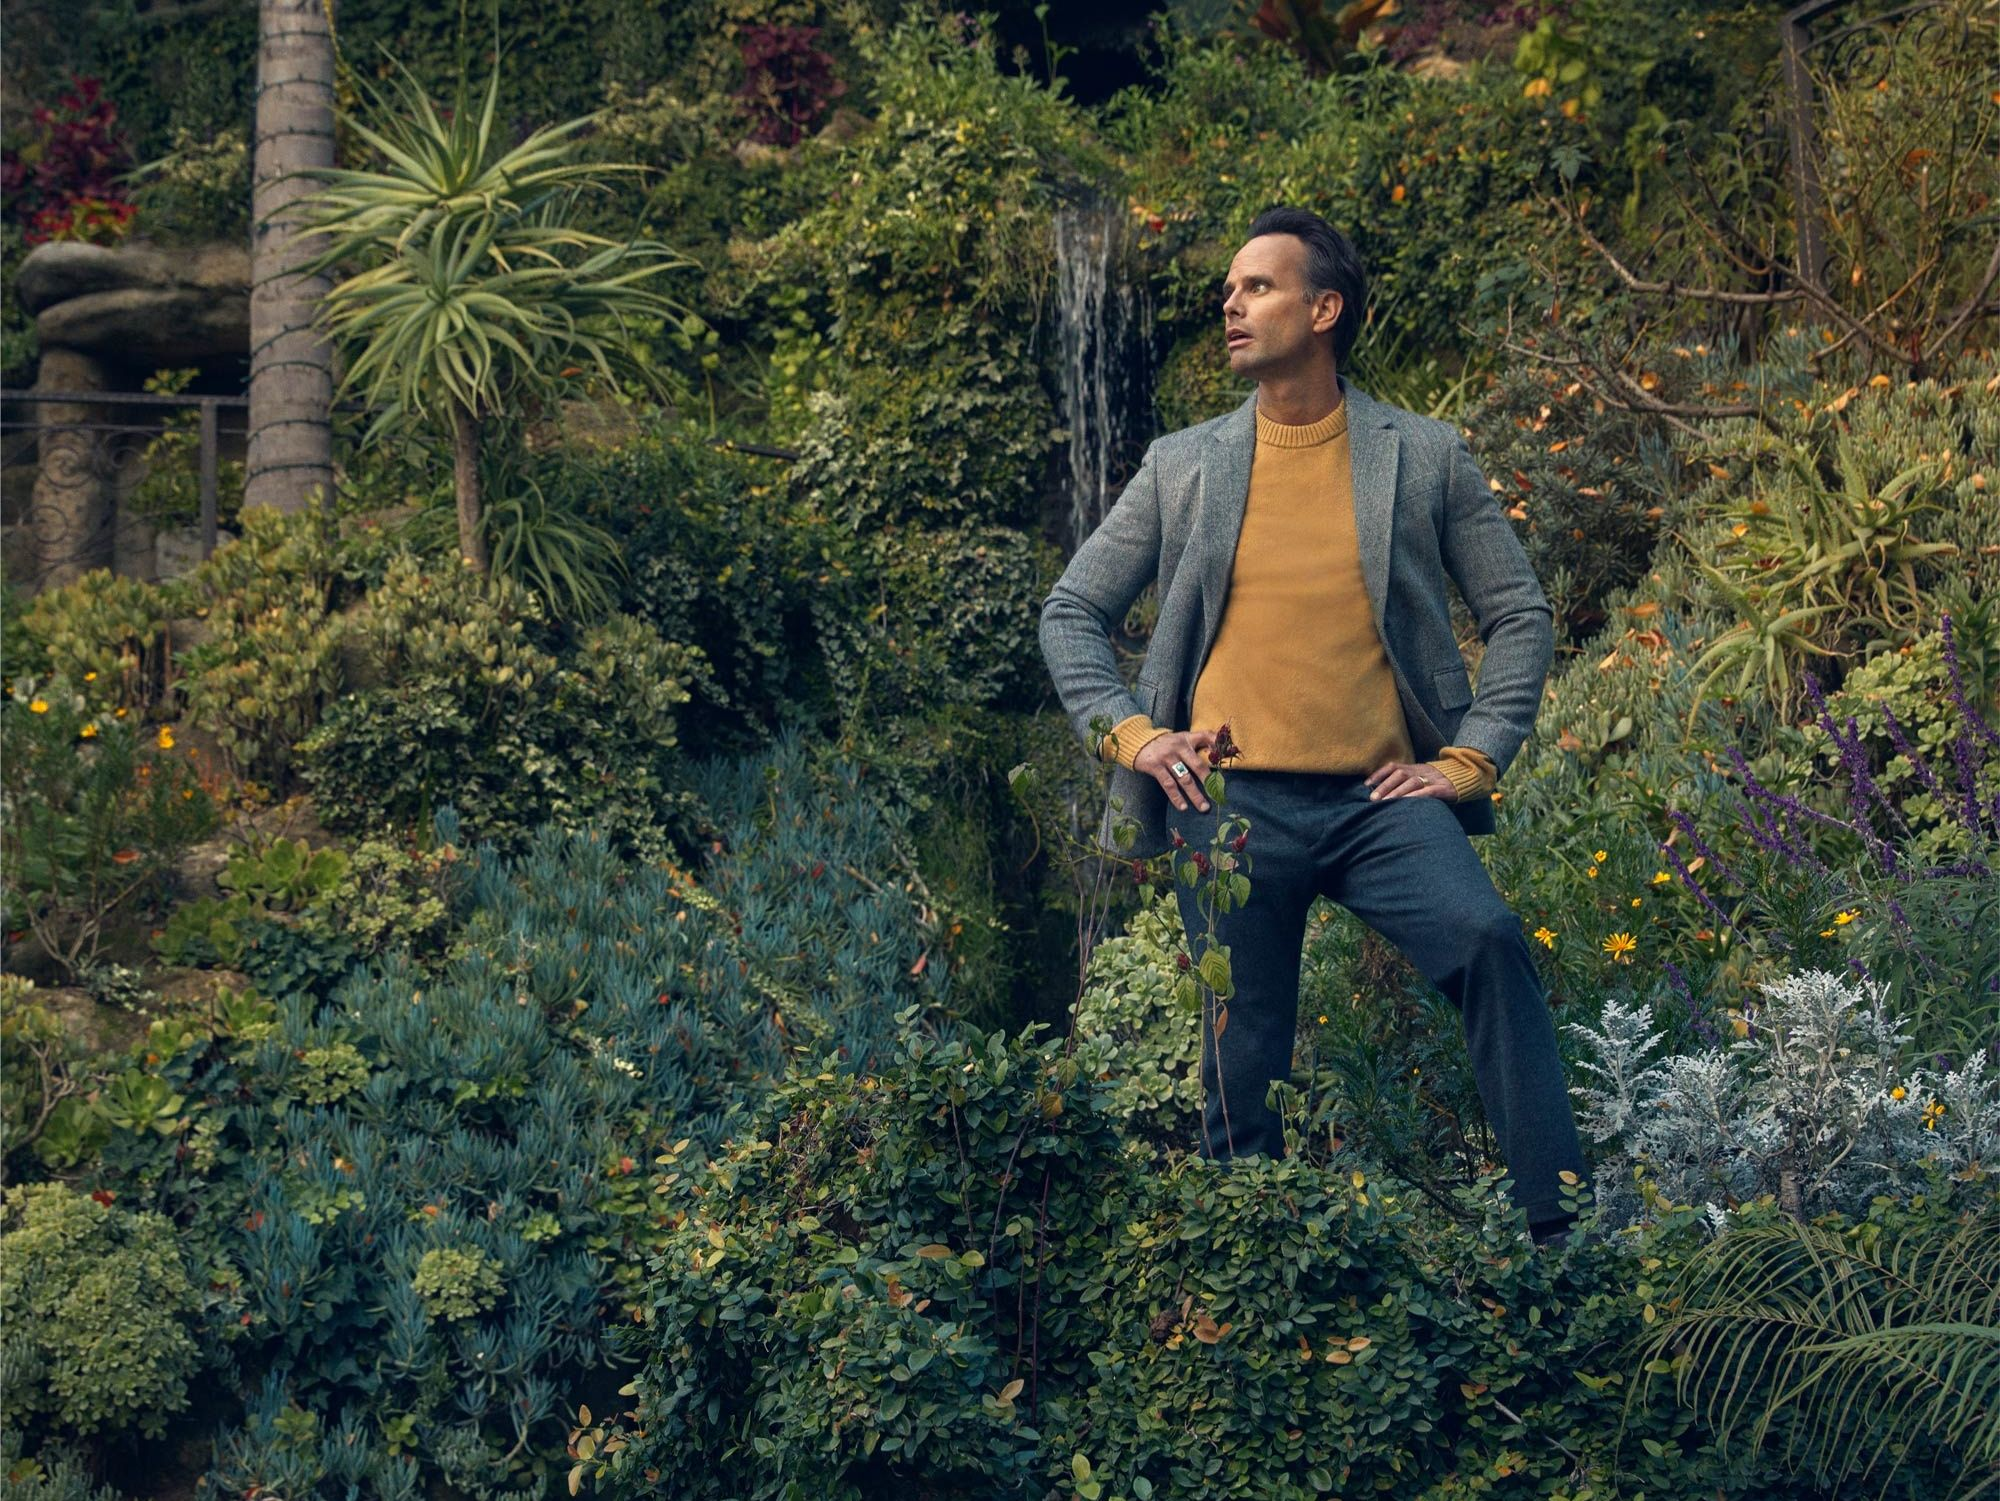 Walton Goggins standing in a beautiful landscaped garden.